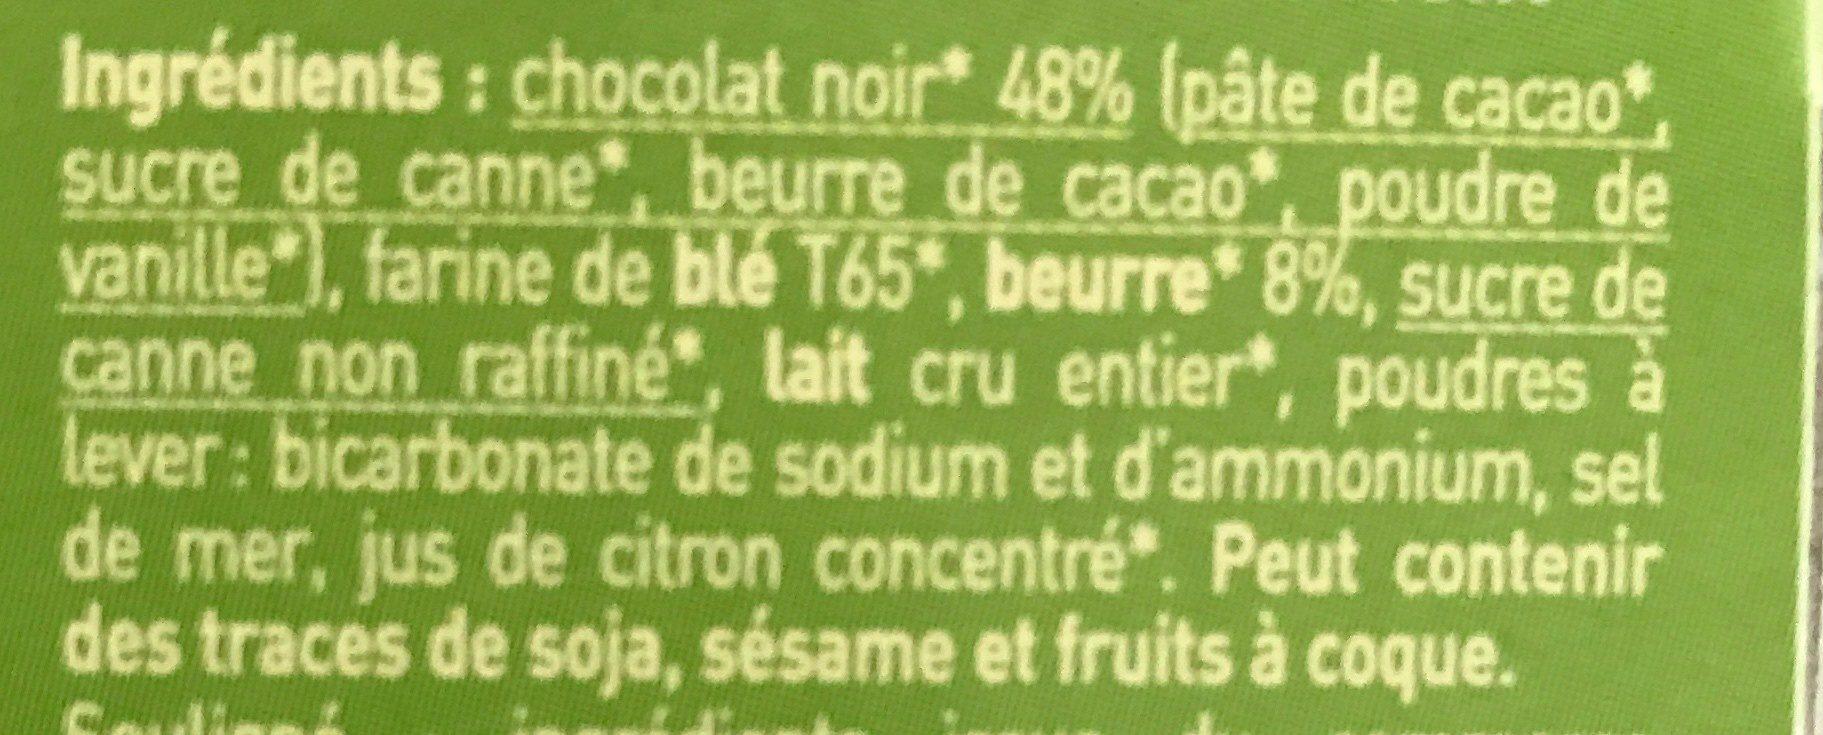 P'tiwi Choc' - Biscuit p'tits beurres très très chocolat noir - Ingrediënten - fr